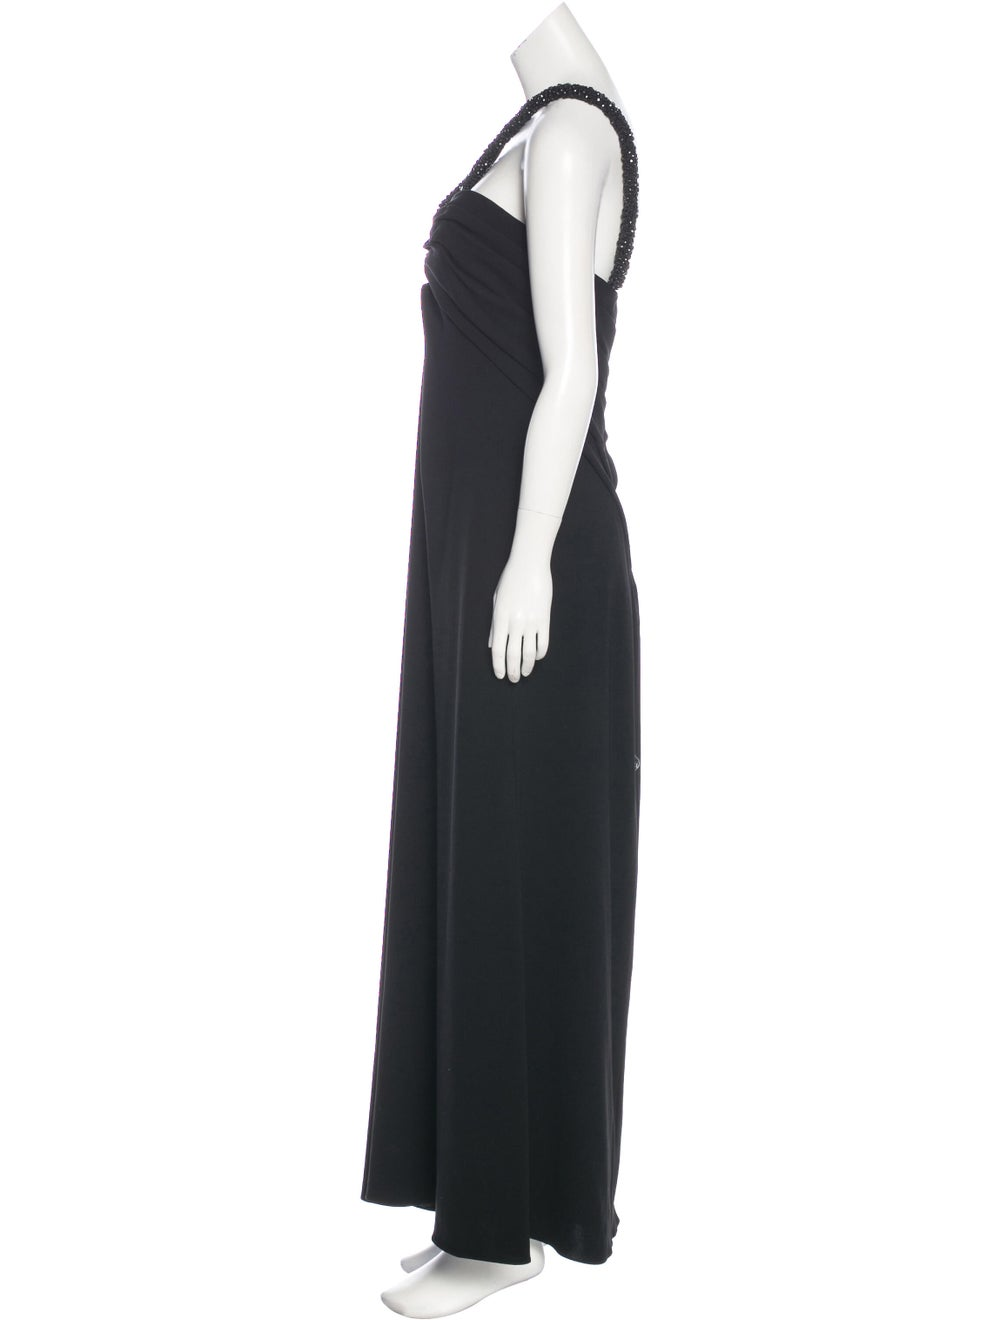 Oscar de la Renta Sleeveless Maxi Dress Black - image 2